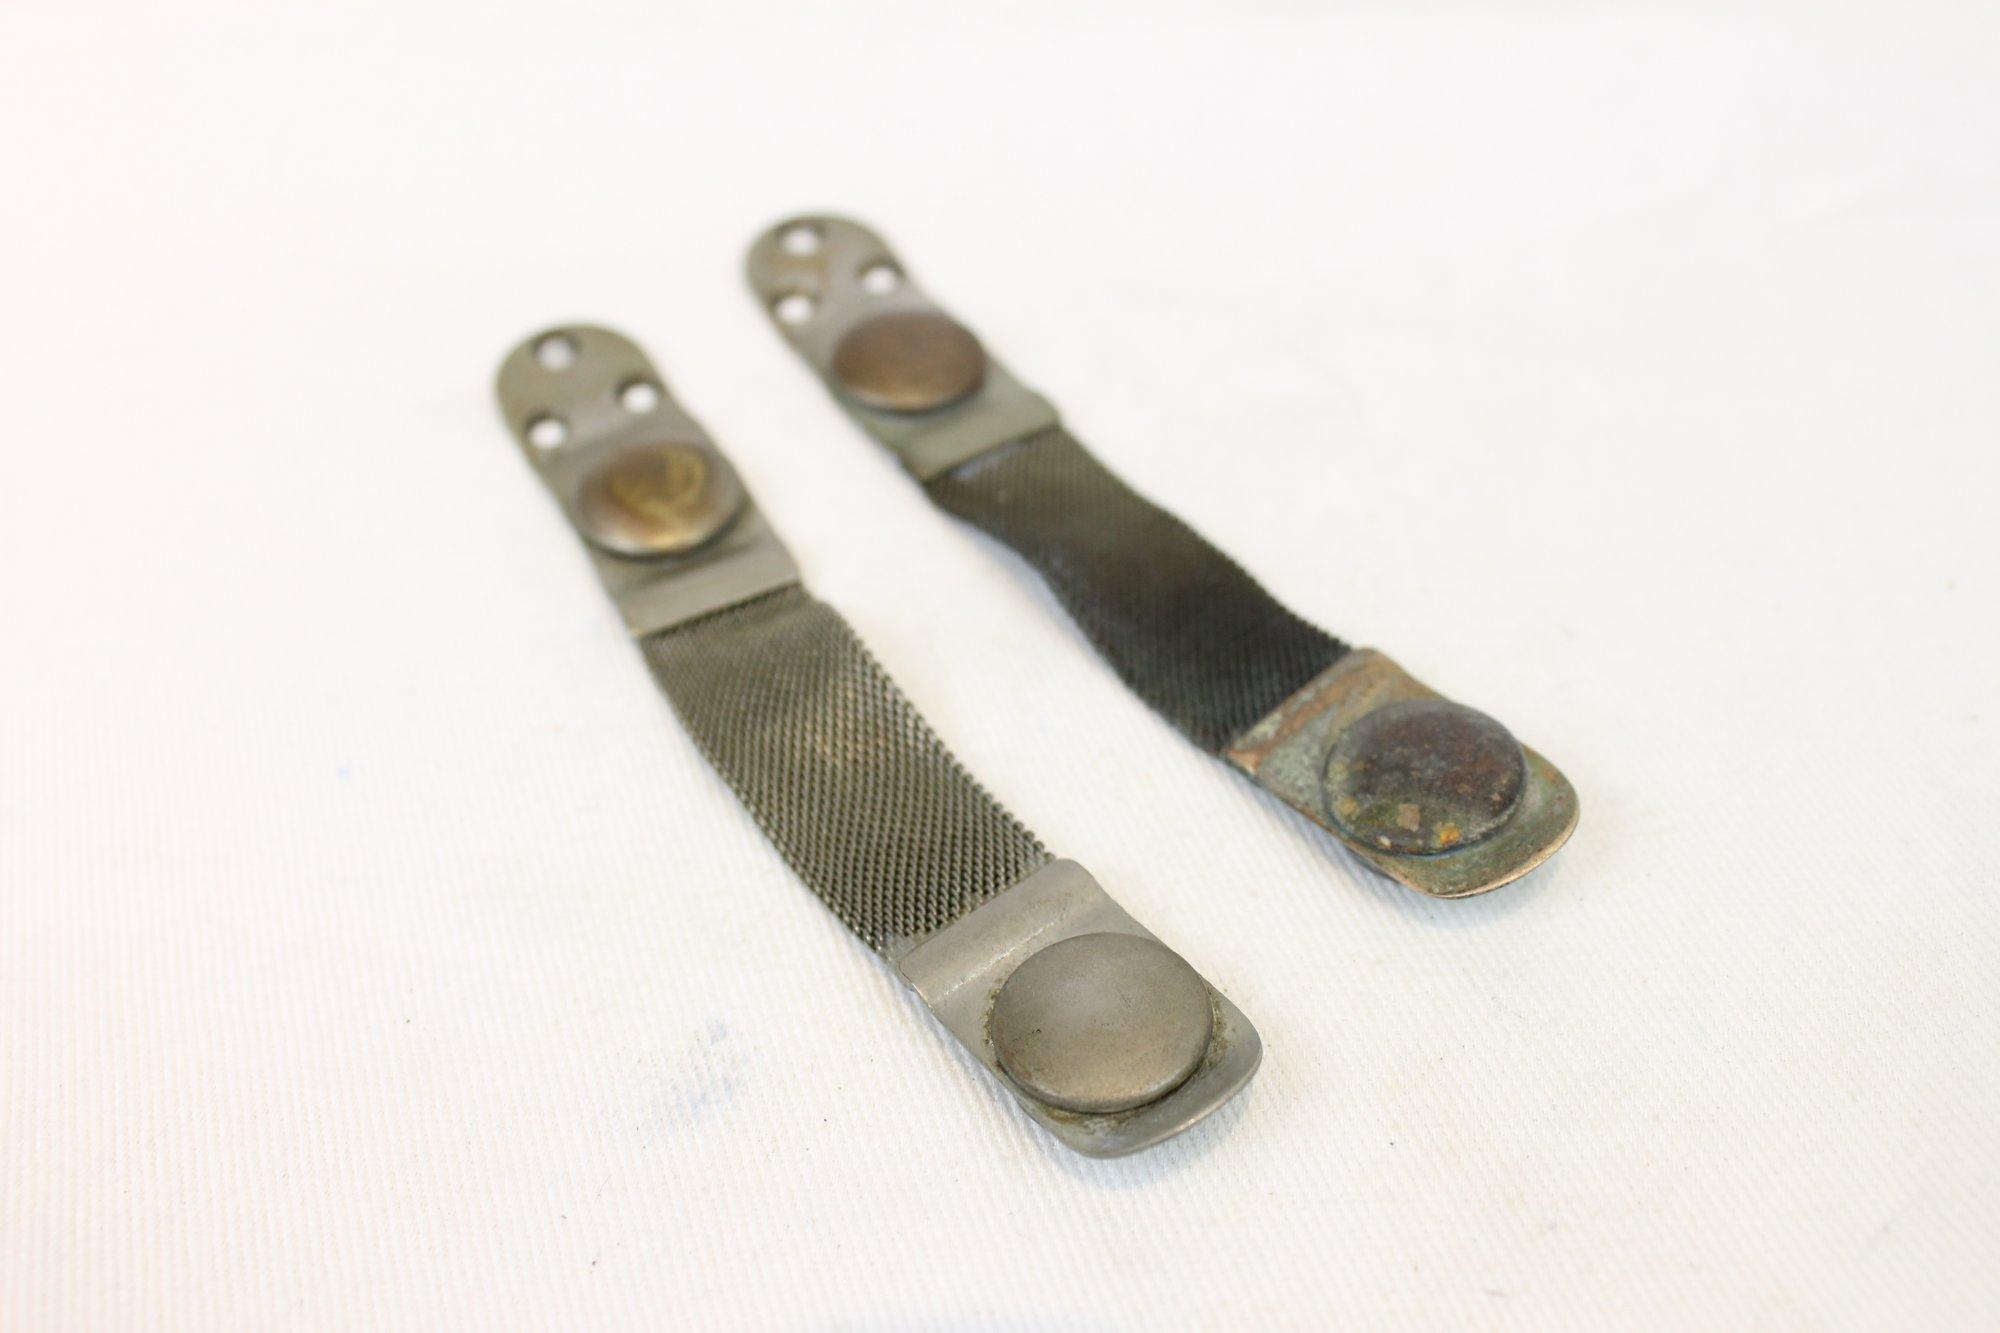 BA2/5 - Accordion Bellows Clasp Part - Pair of 2 Pieces